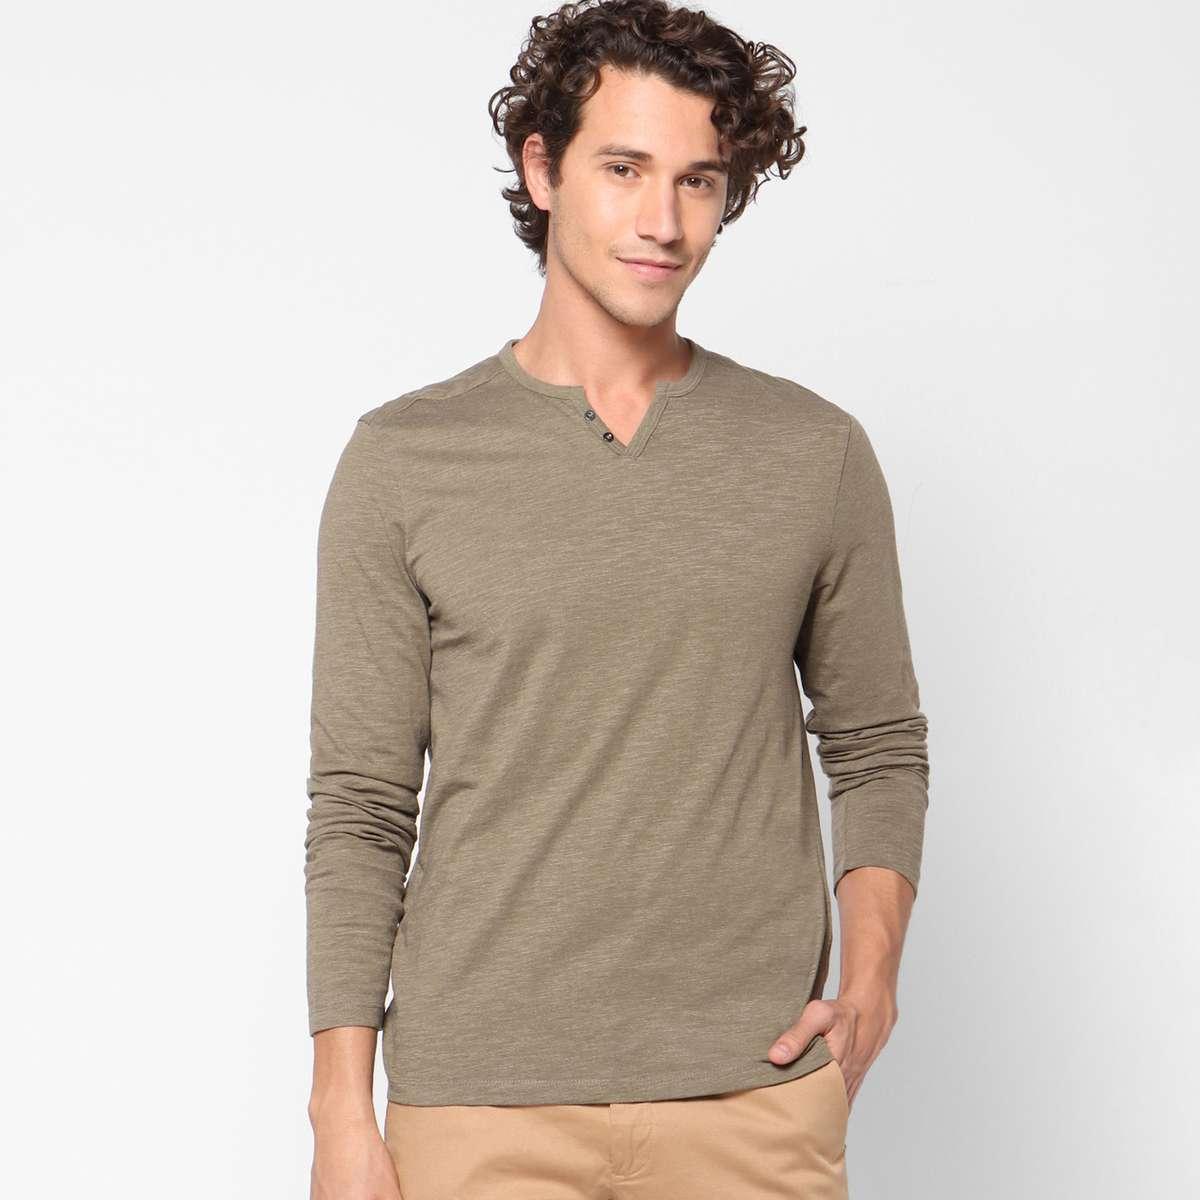 3.CELIO Men Solid Slim Fit Henley T-shirt